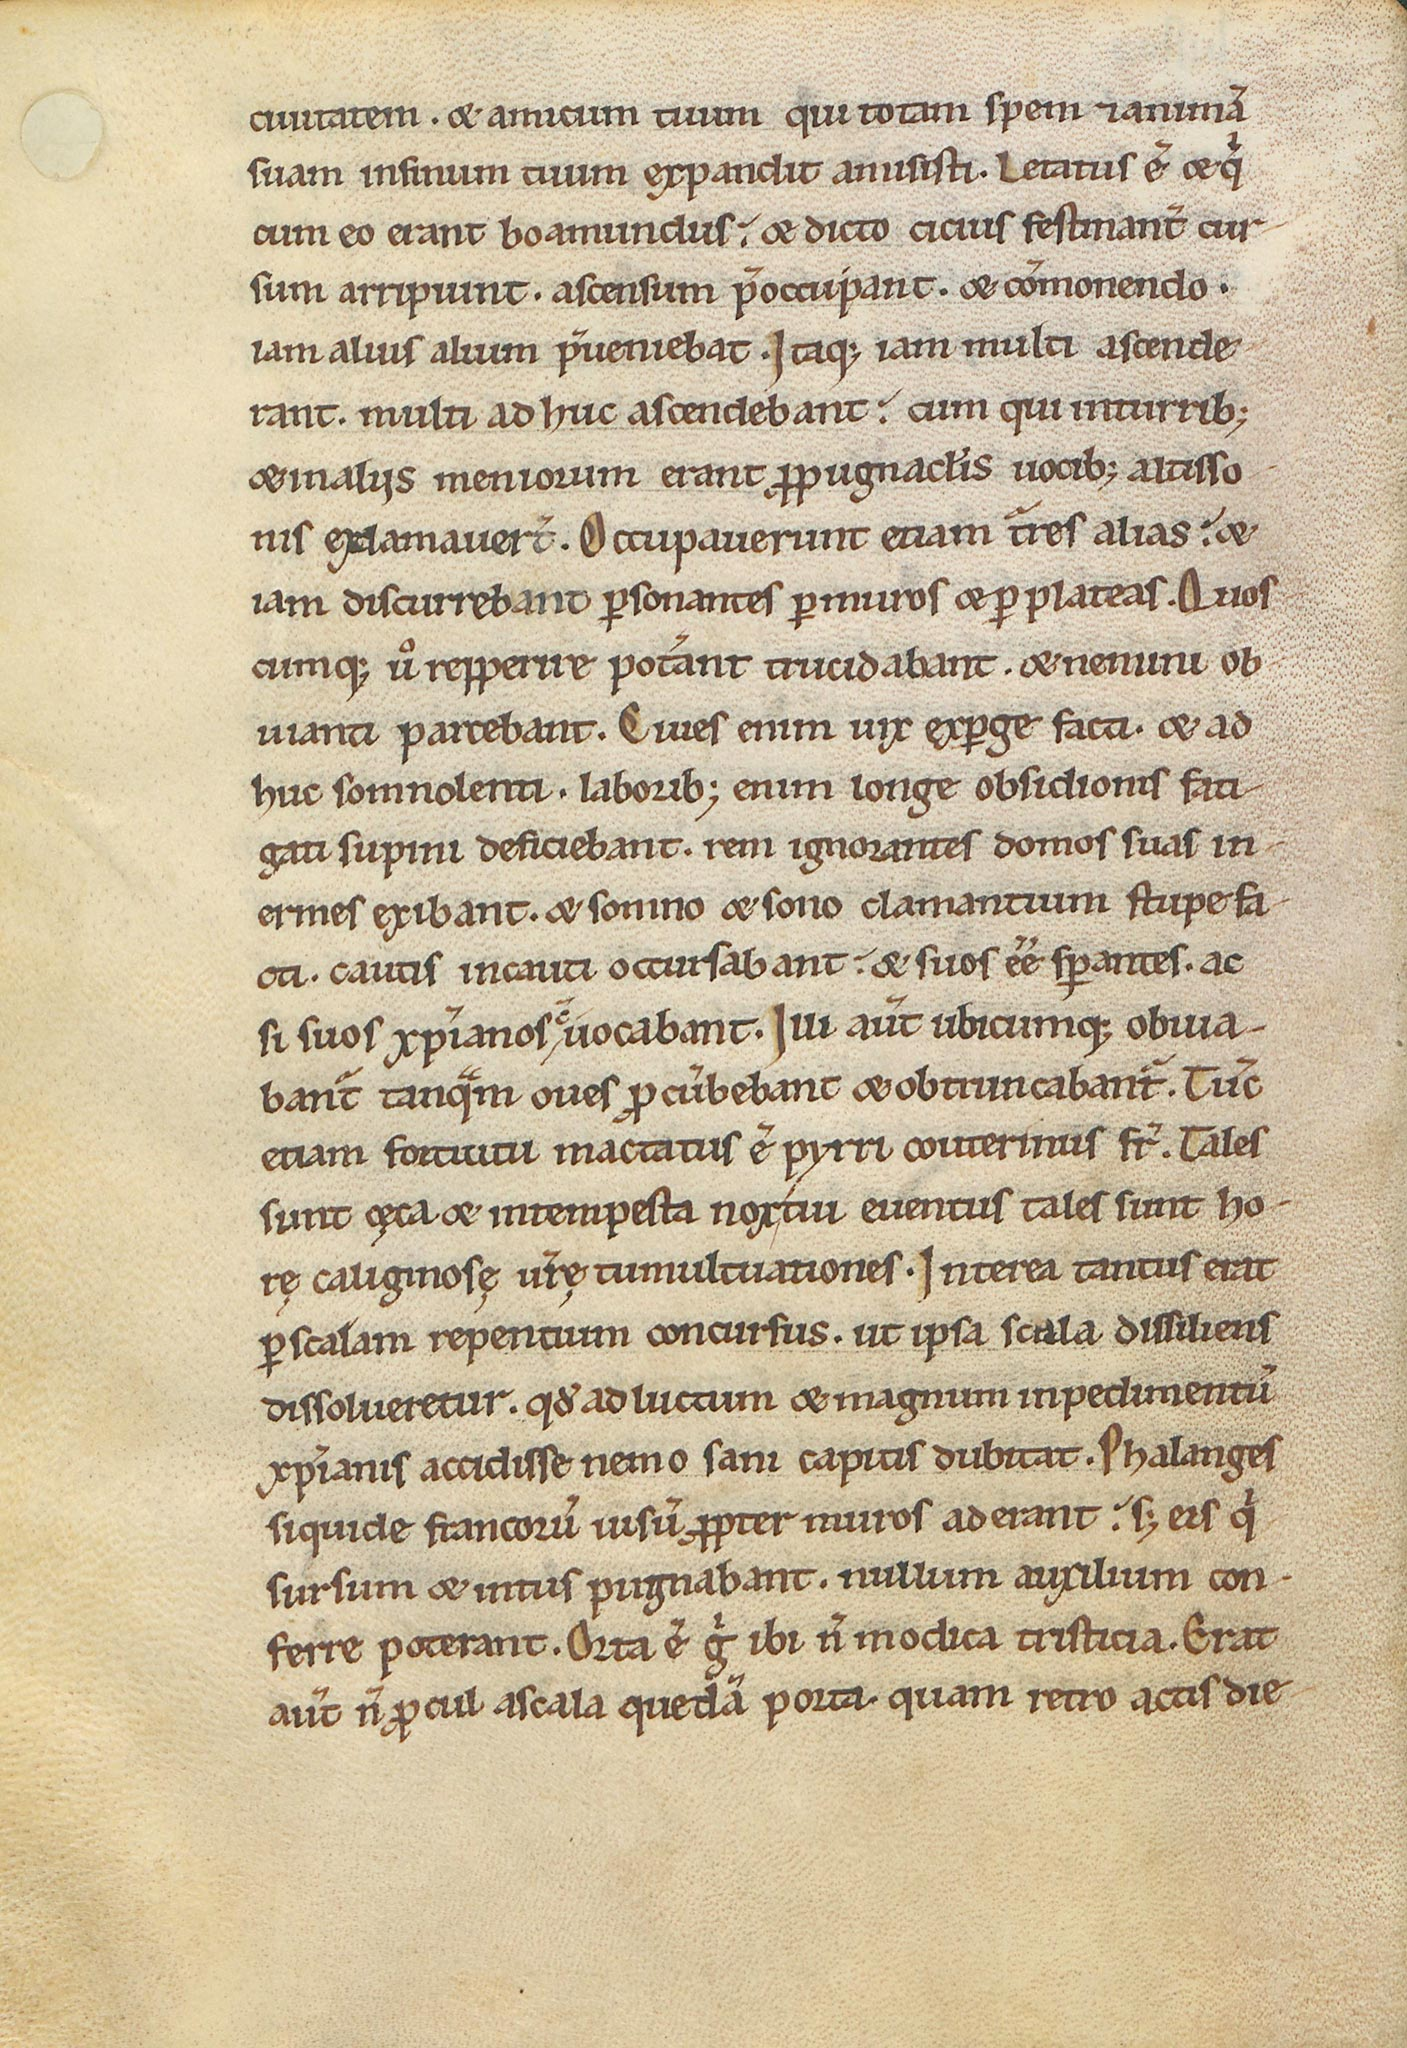 Manuscrit-Historia-Hierosolimitana-59v°